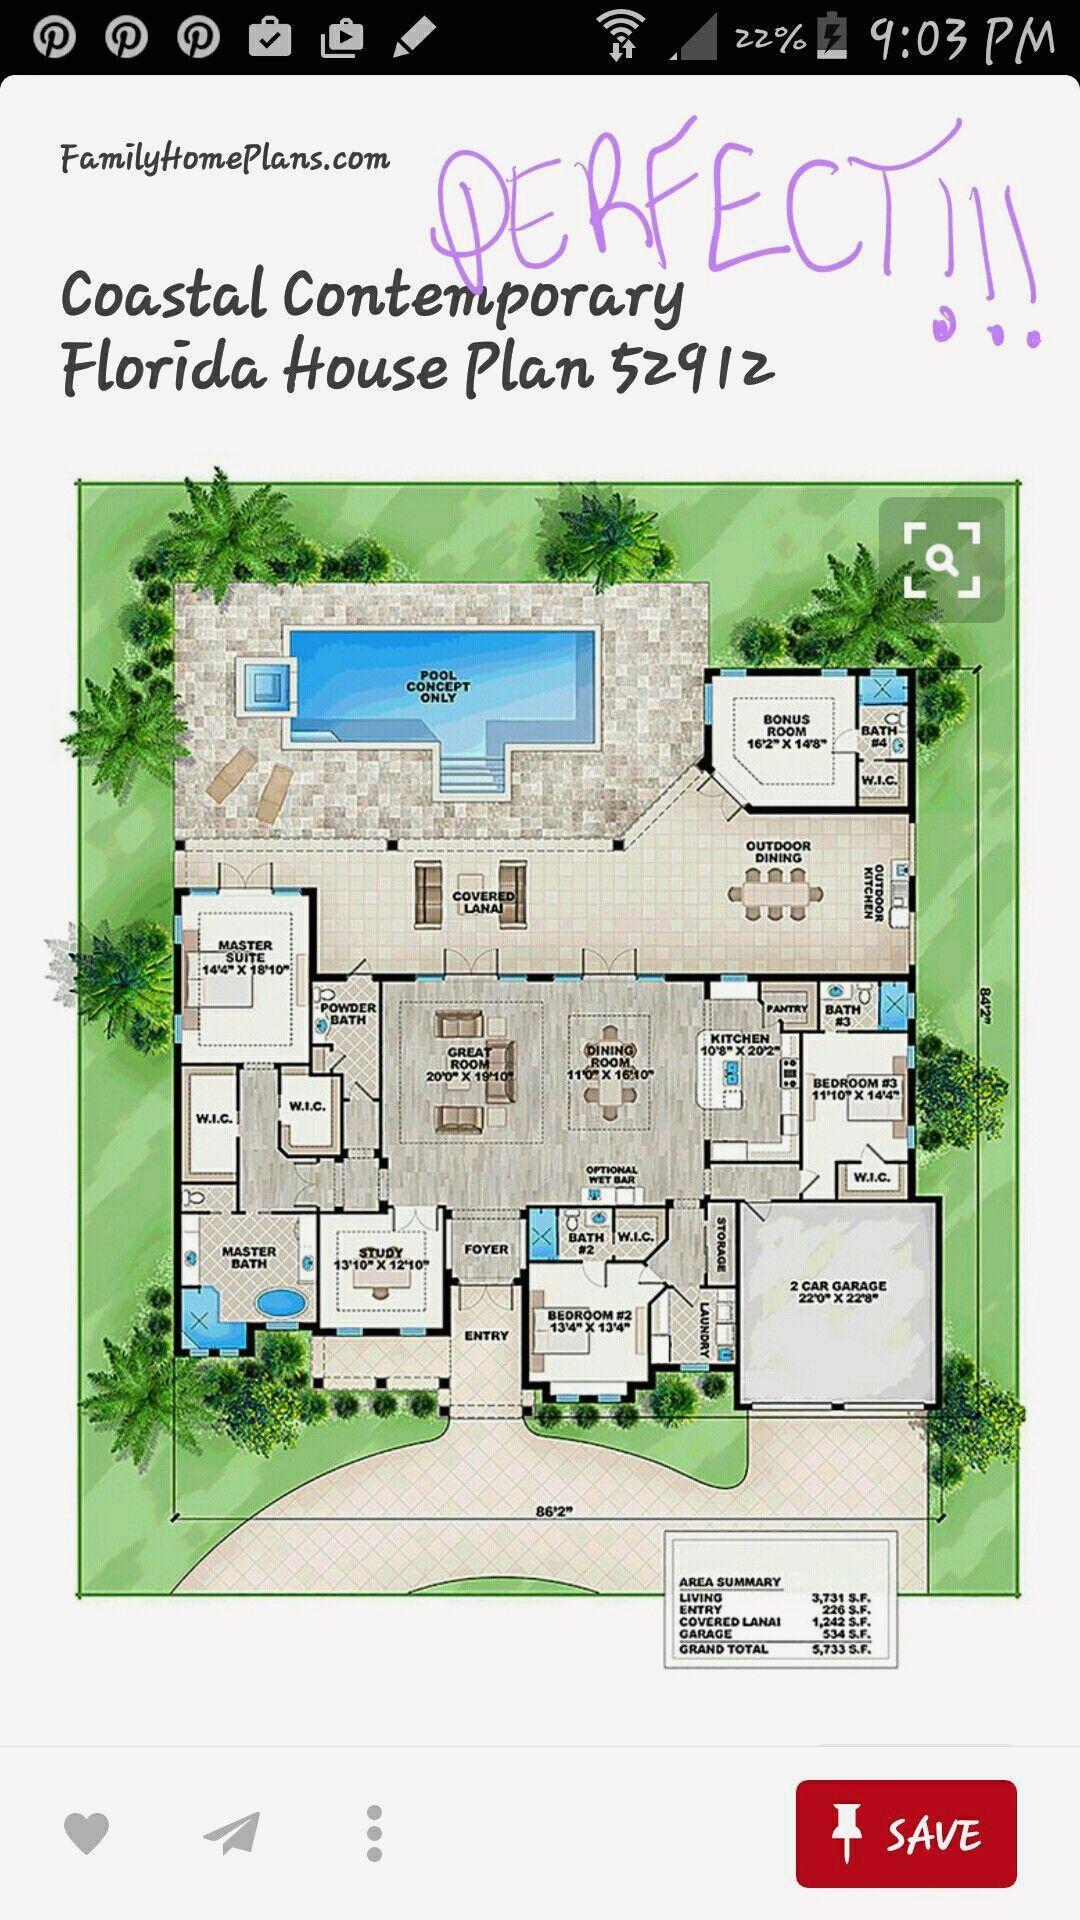 13 Beach House Floor Plan Ideas Www Femexesgrima Net Www Femexesgrima Net Florida House Plans Beach House Flooring Home Design Floor Plans